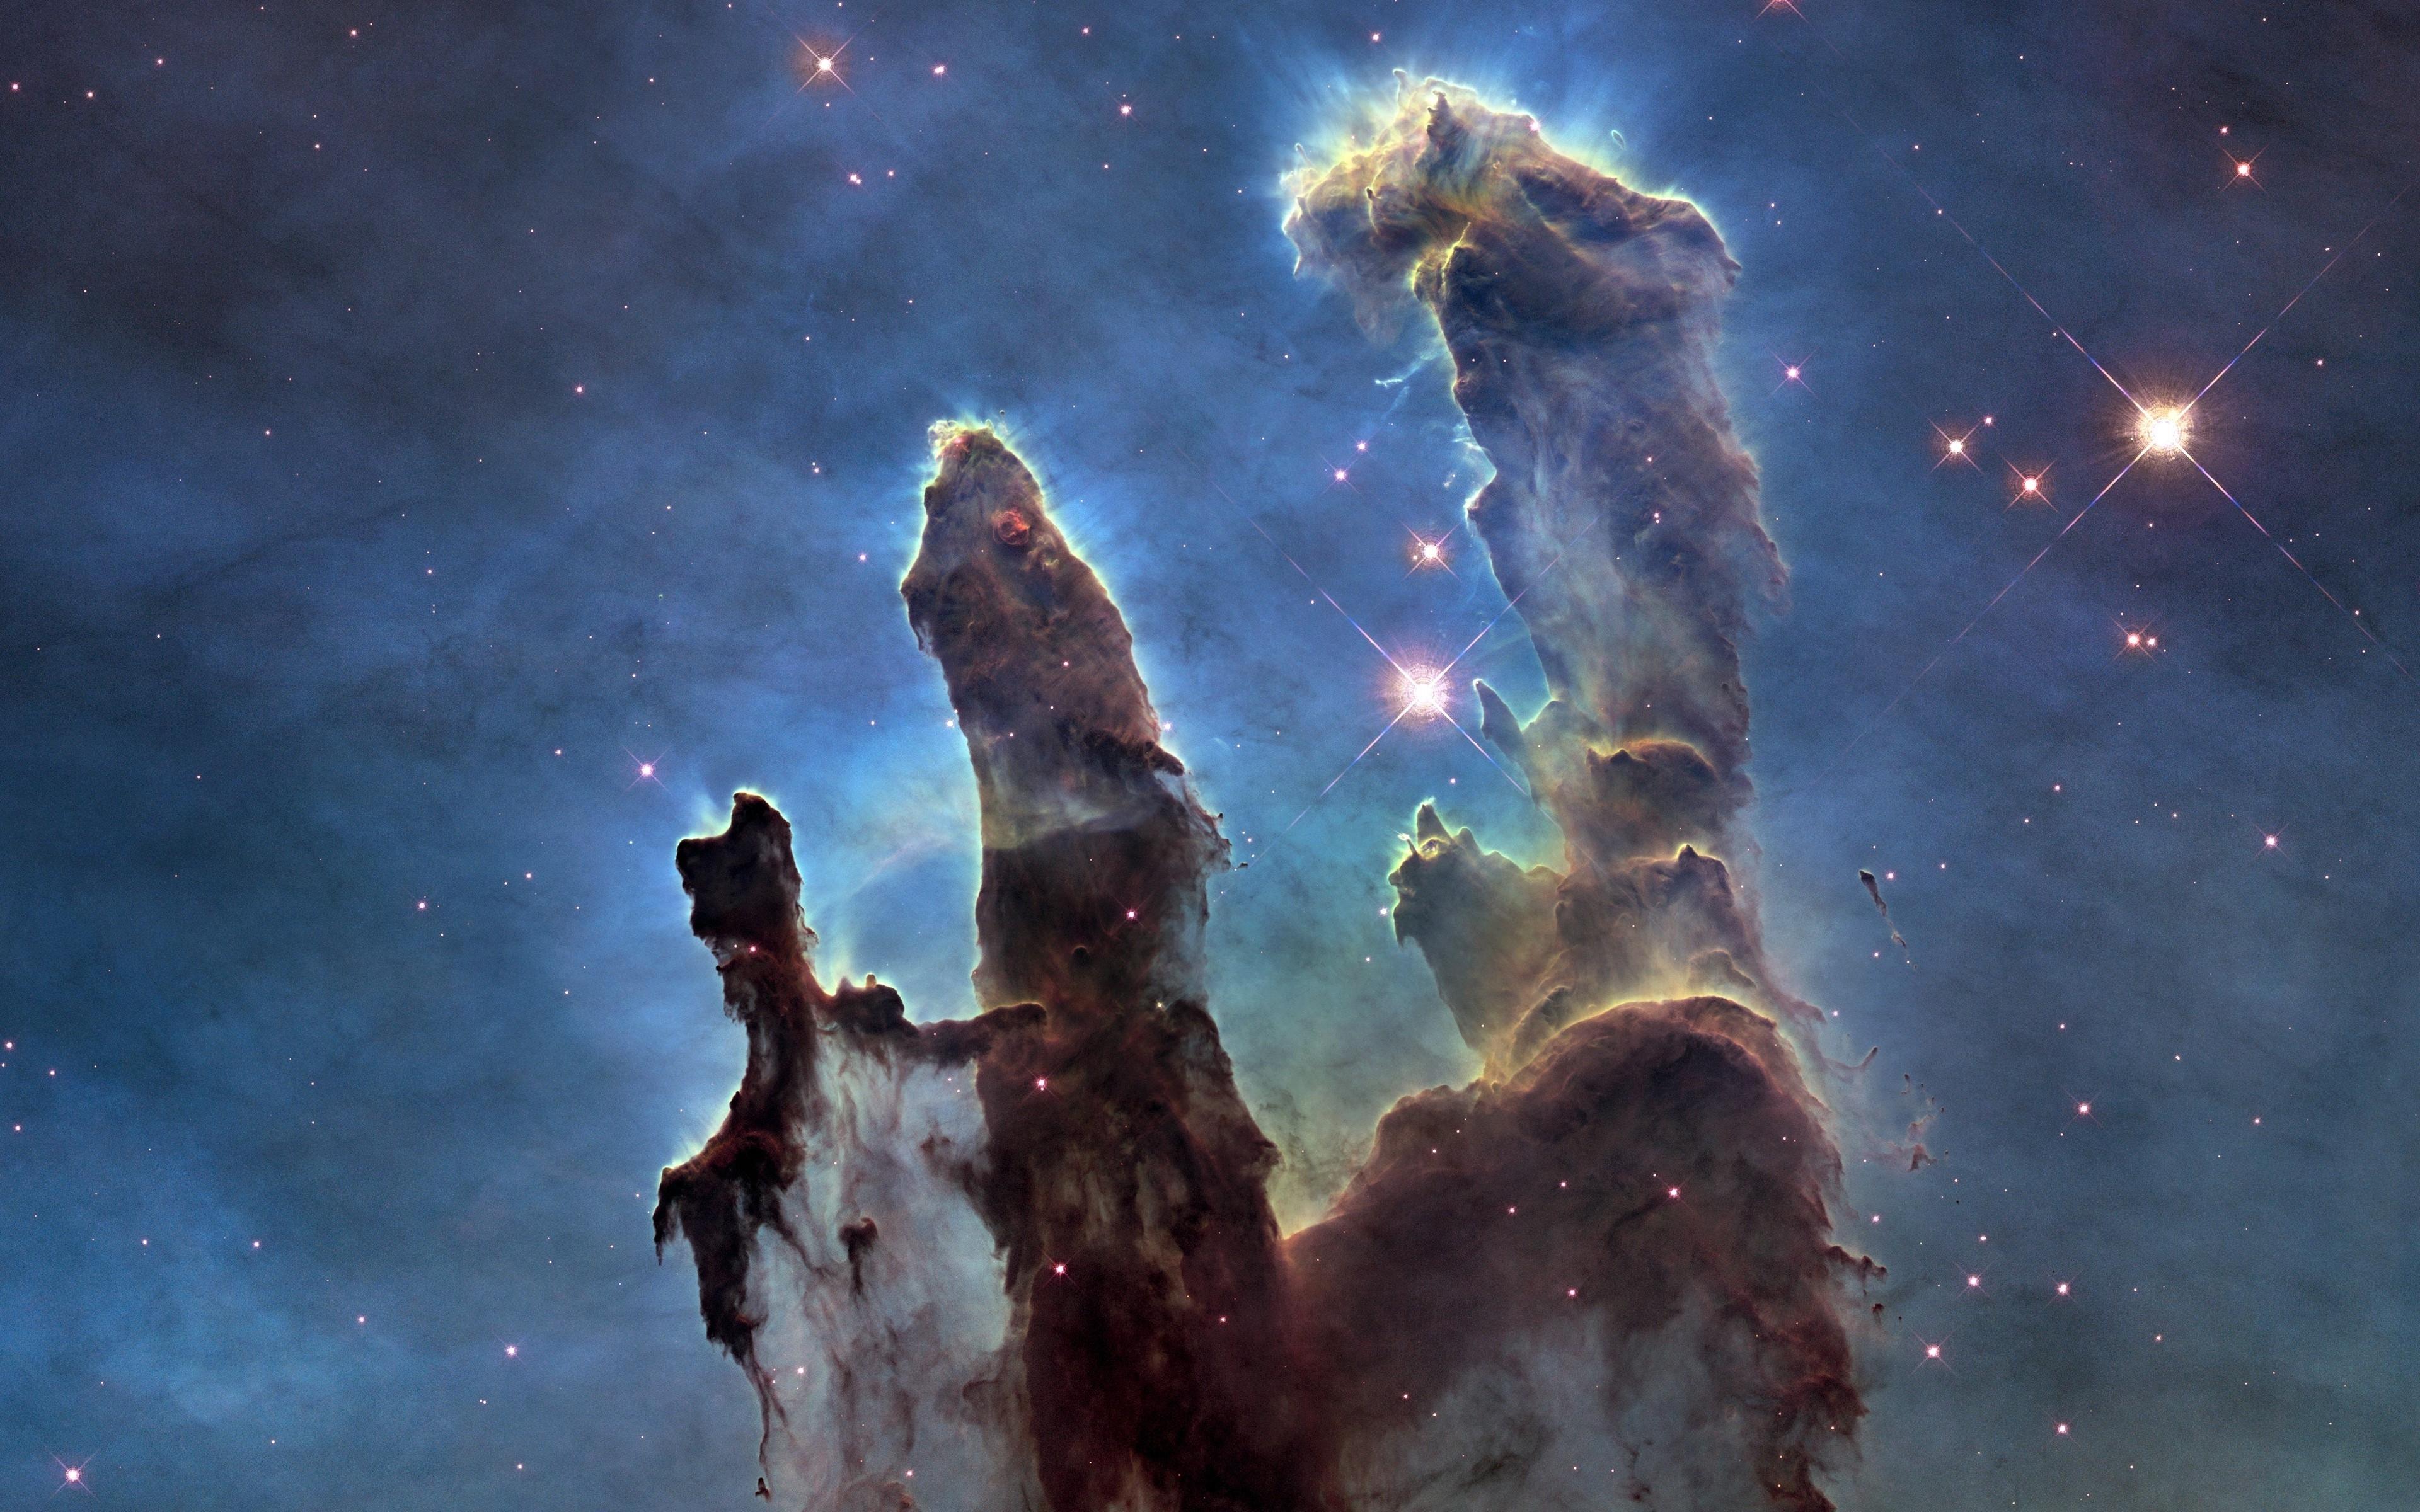 wallpaper : 3840x2400 px, nebula, pillars of creation, space, stars